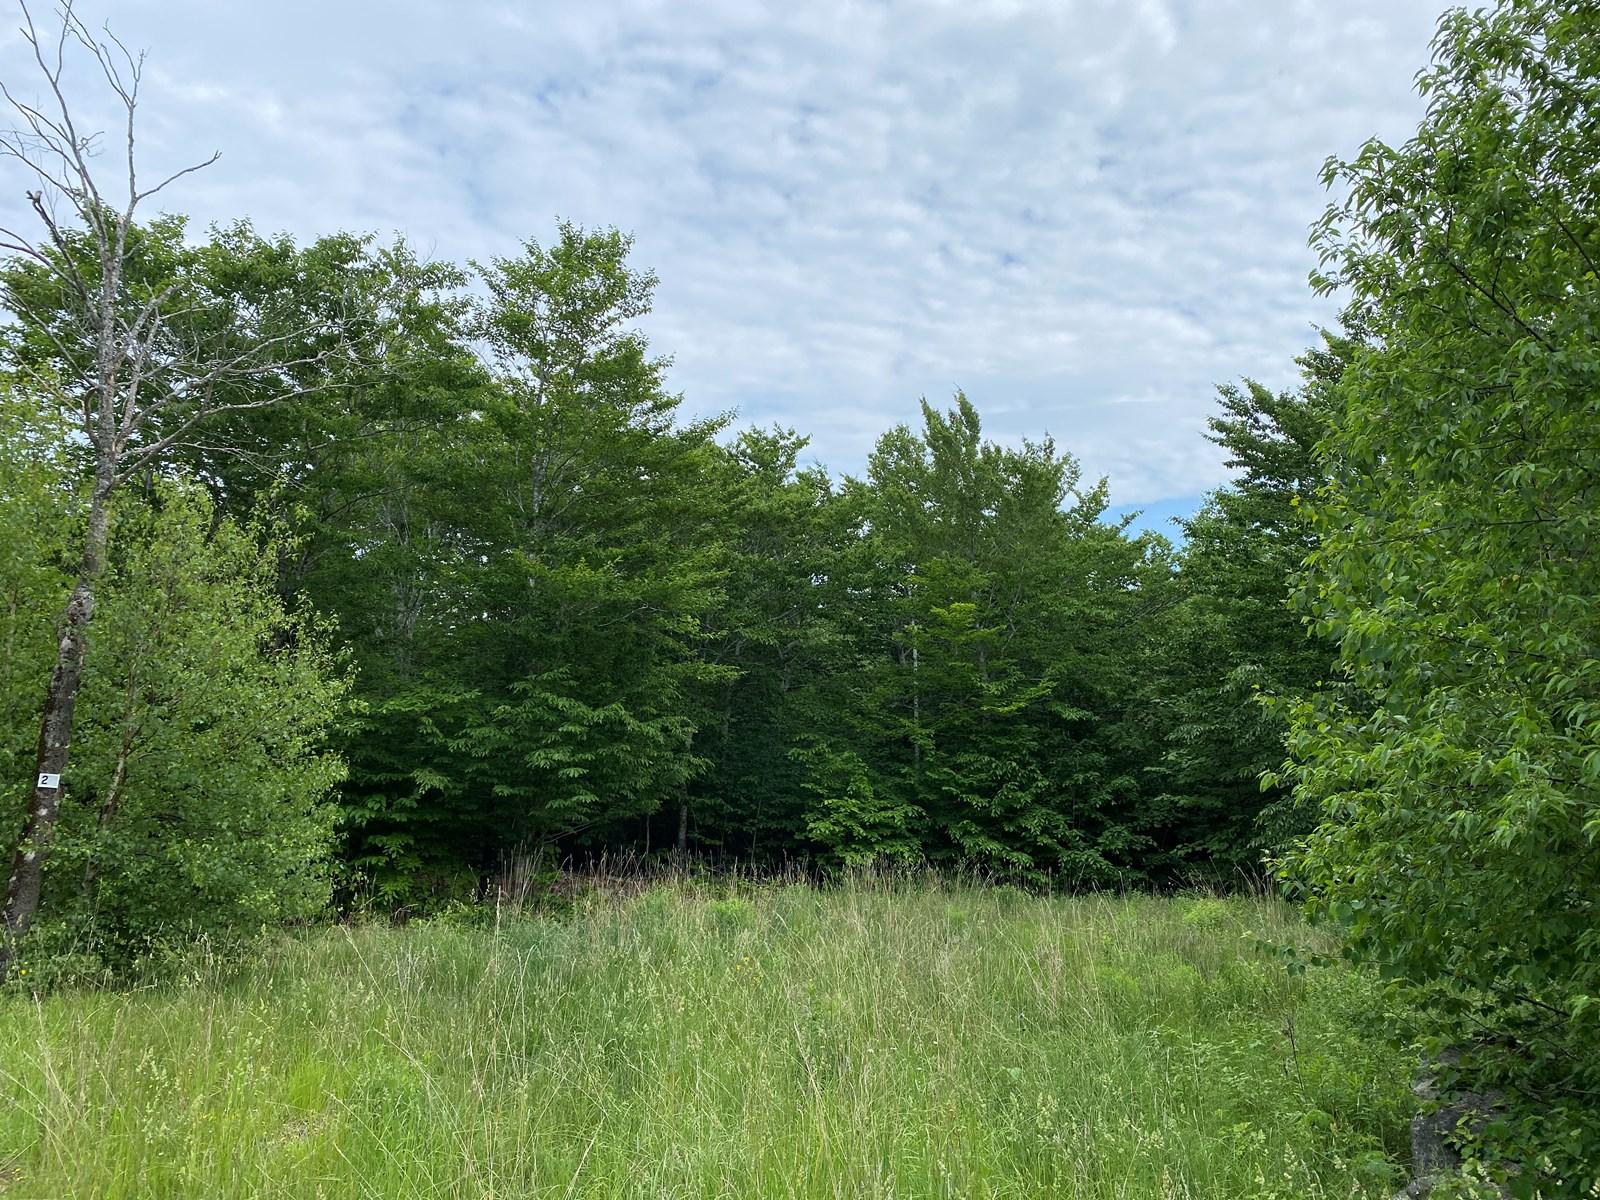 Land in Dedham, Maine